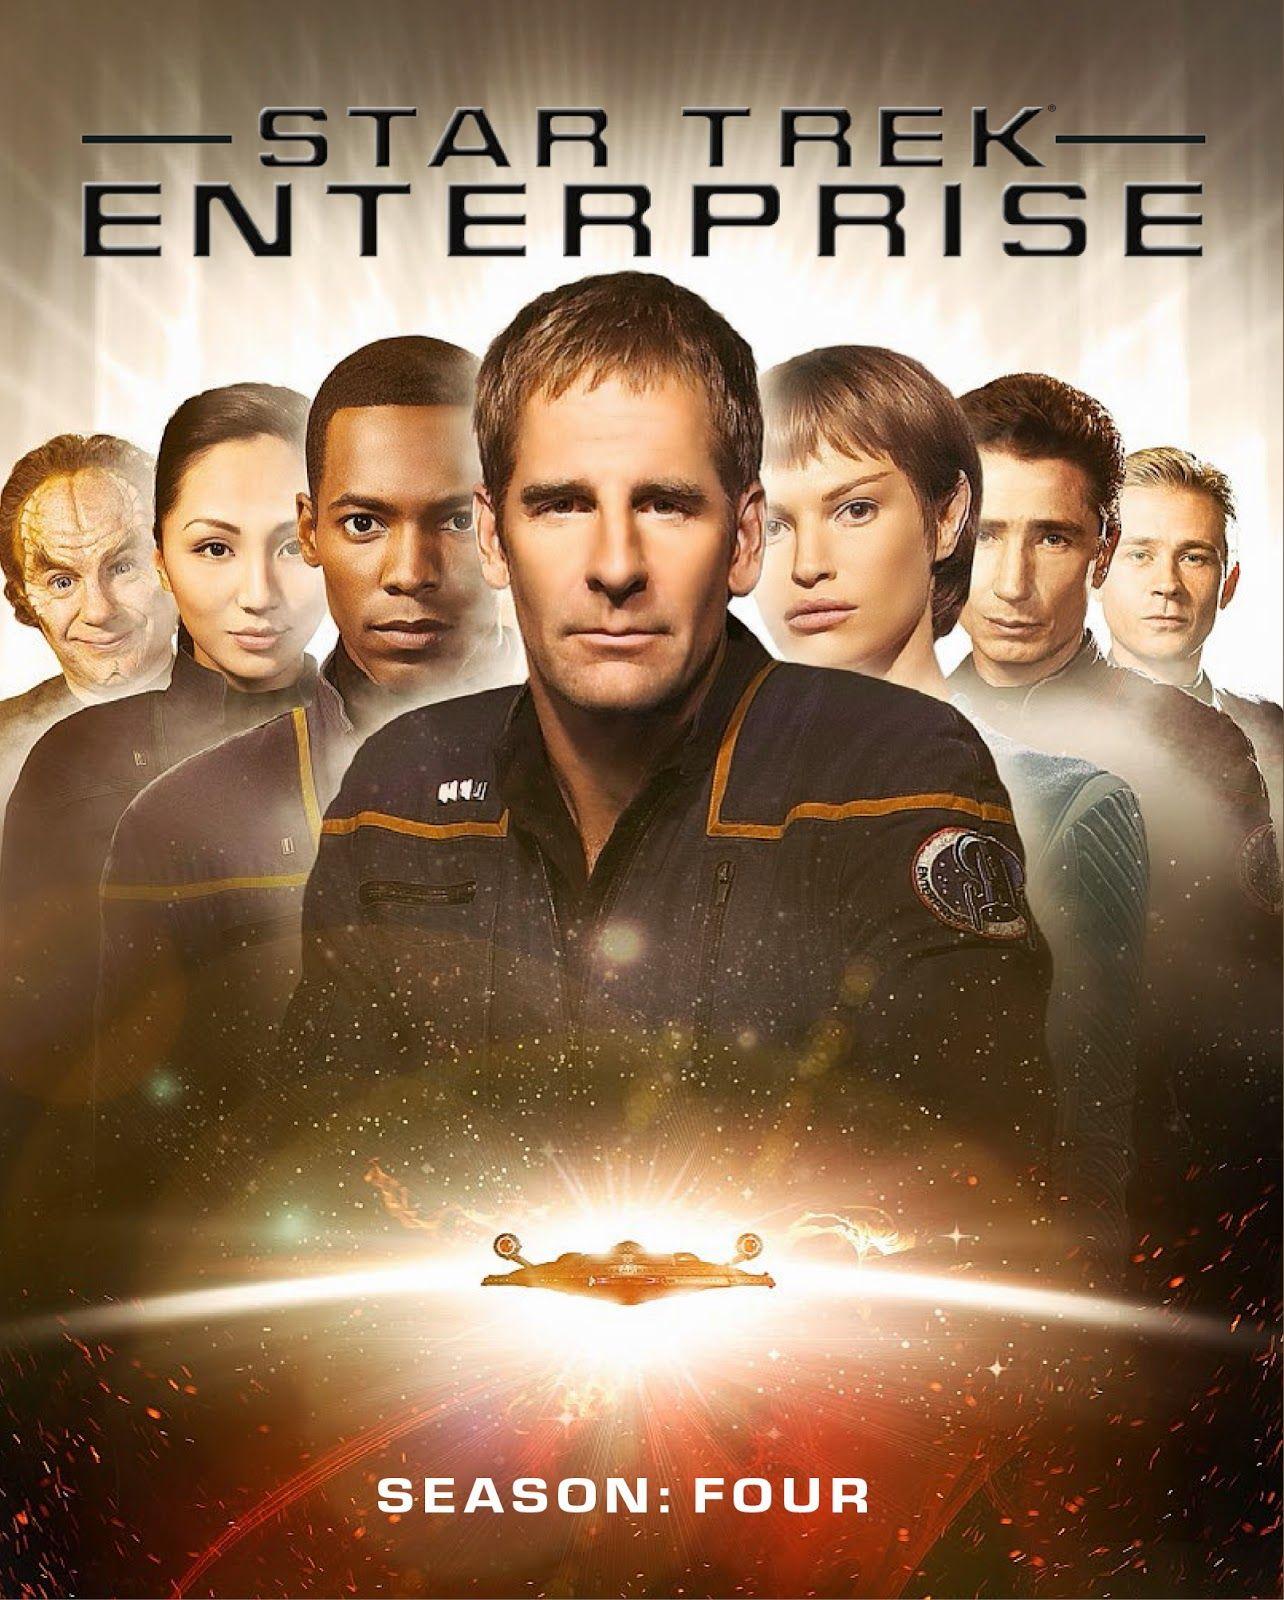 68 Star Trek Enterprise 2004 05 S04 3 5 18 05 18 Potser La Temporada Més Fluixa La Nave Enterprise De Star Trek Cine Musica Libros Star Trek